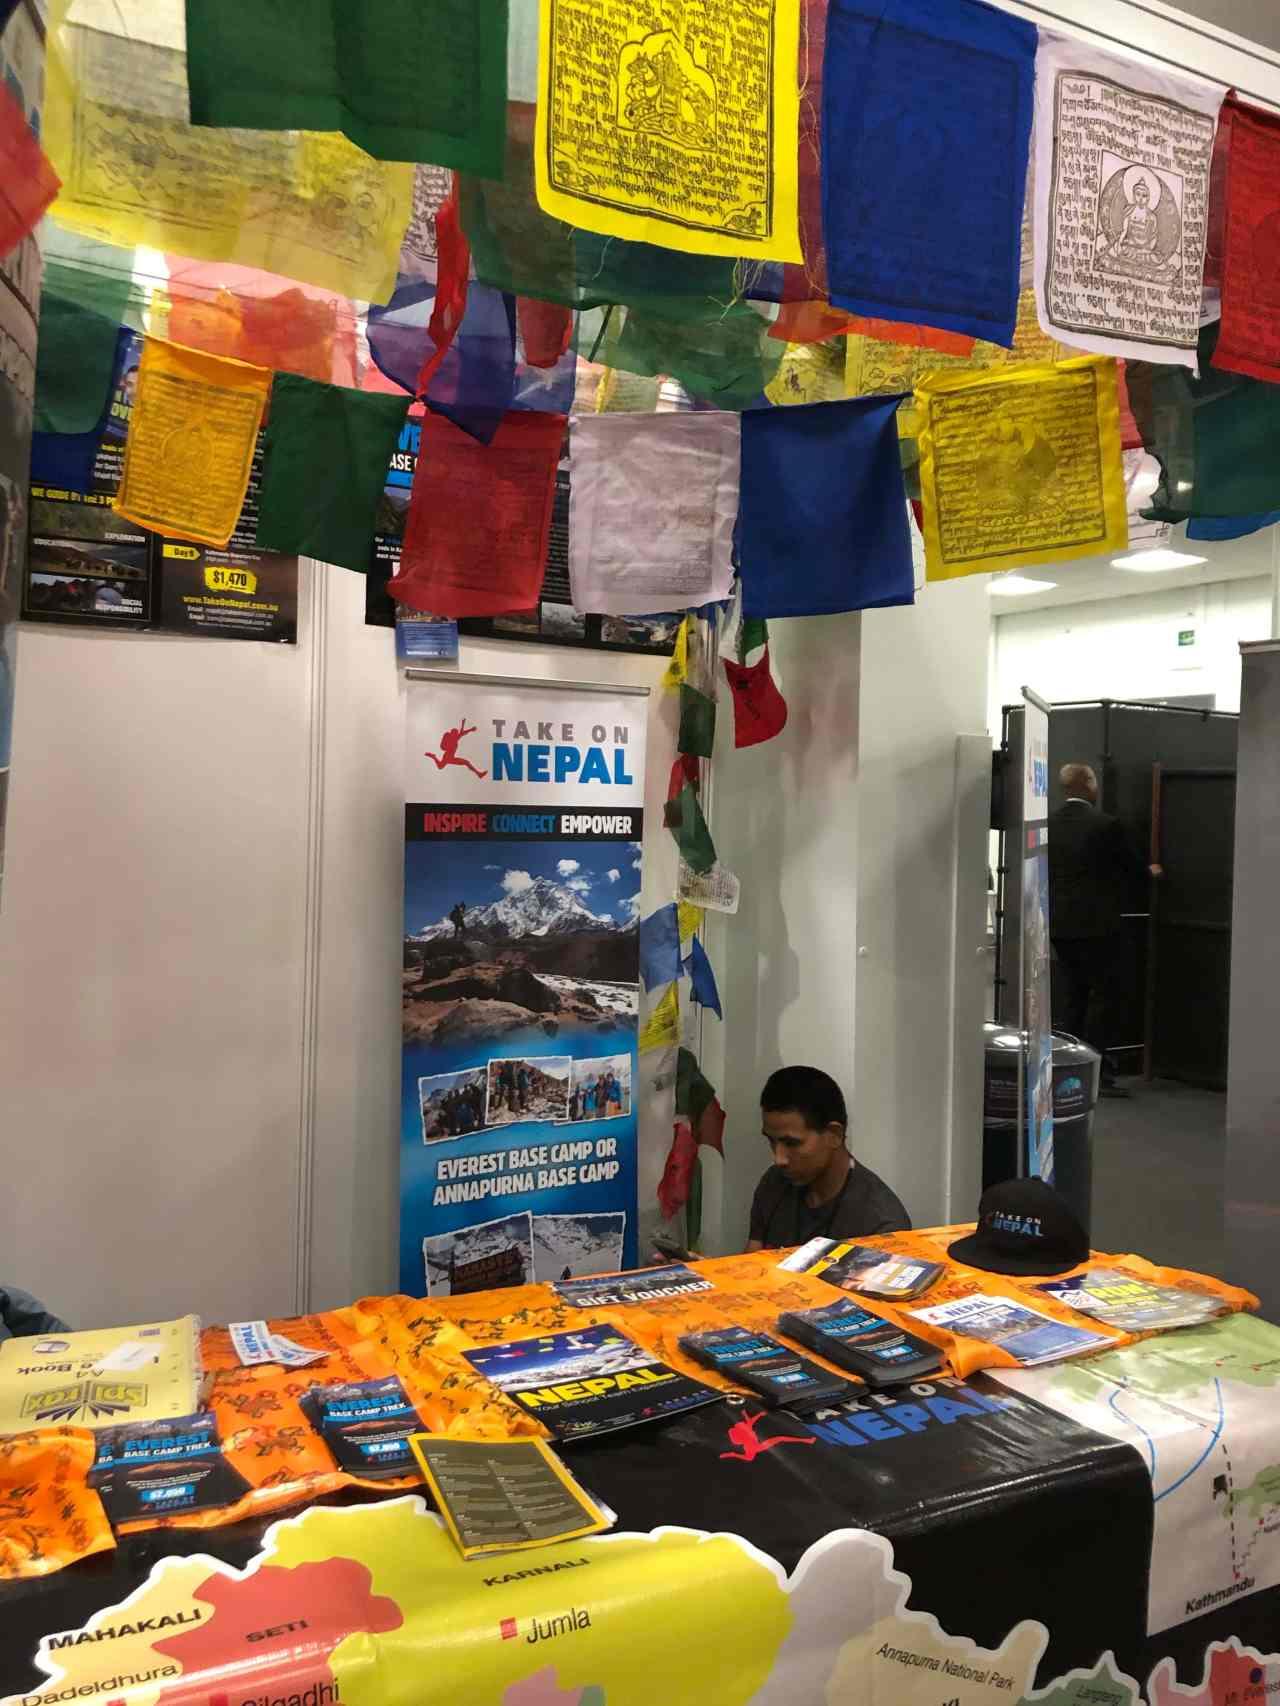 Adventure travel show Nepal stand